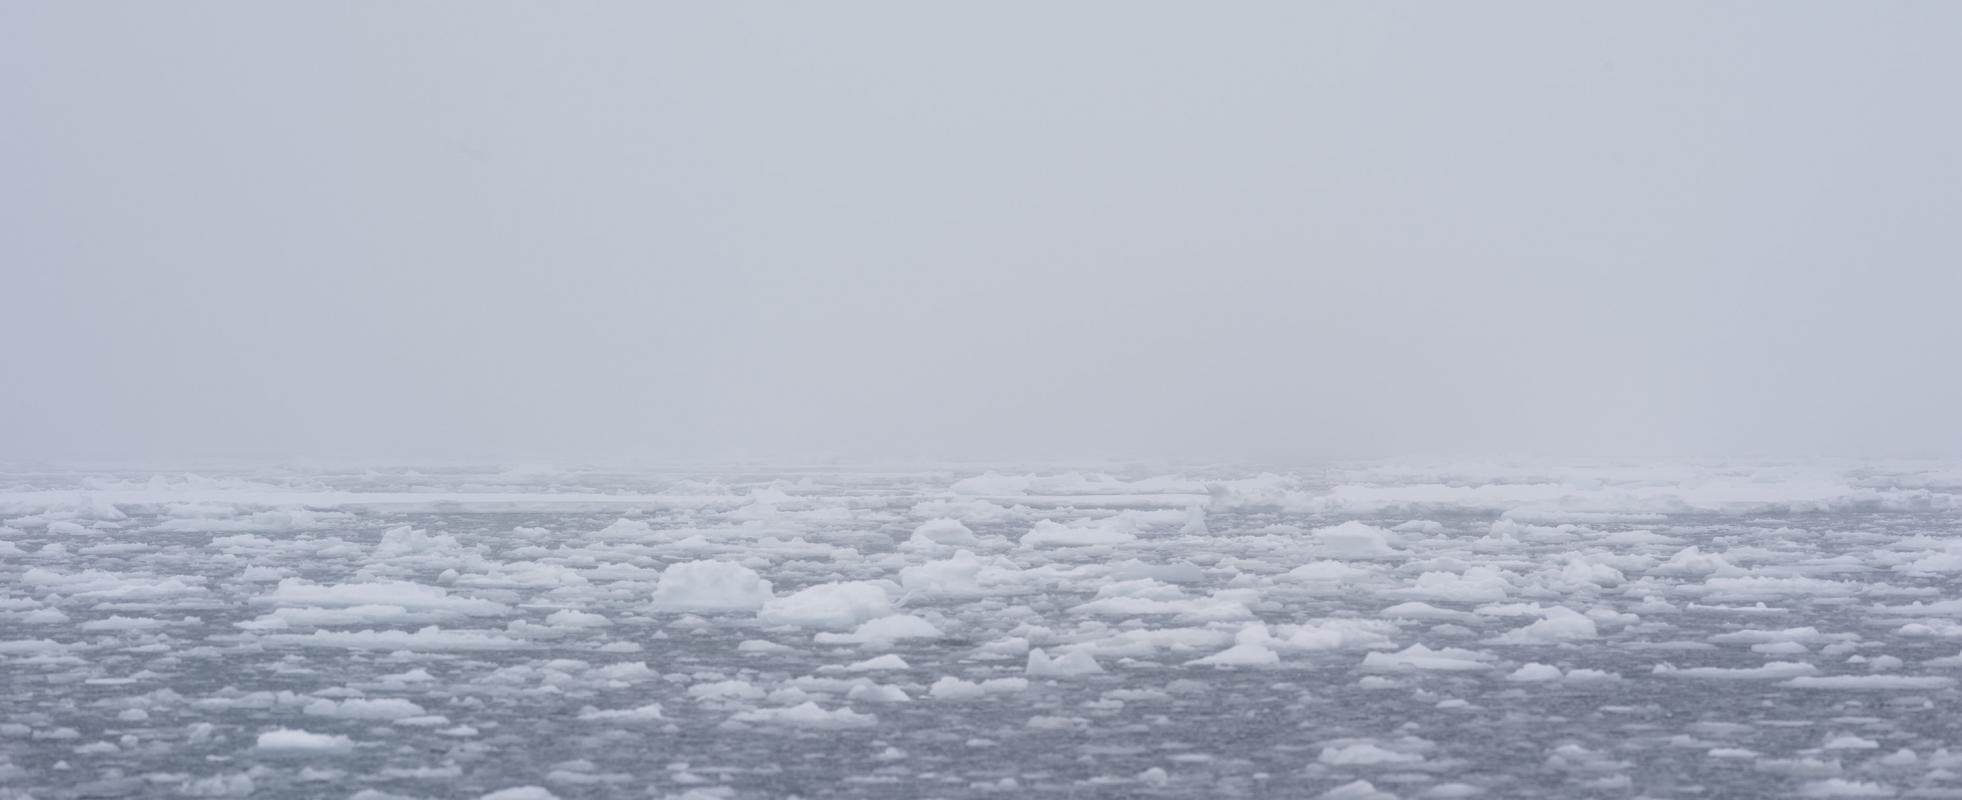 The Ice Breathes, © Julie Stephenson, Australia, 1st Place, Tokyo International Foto Awards